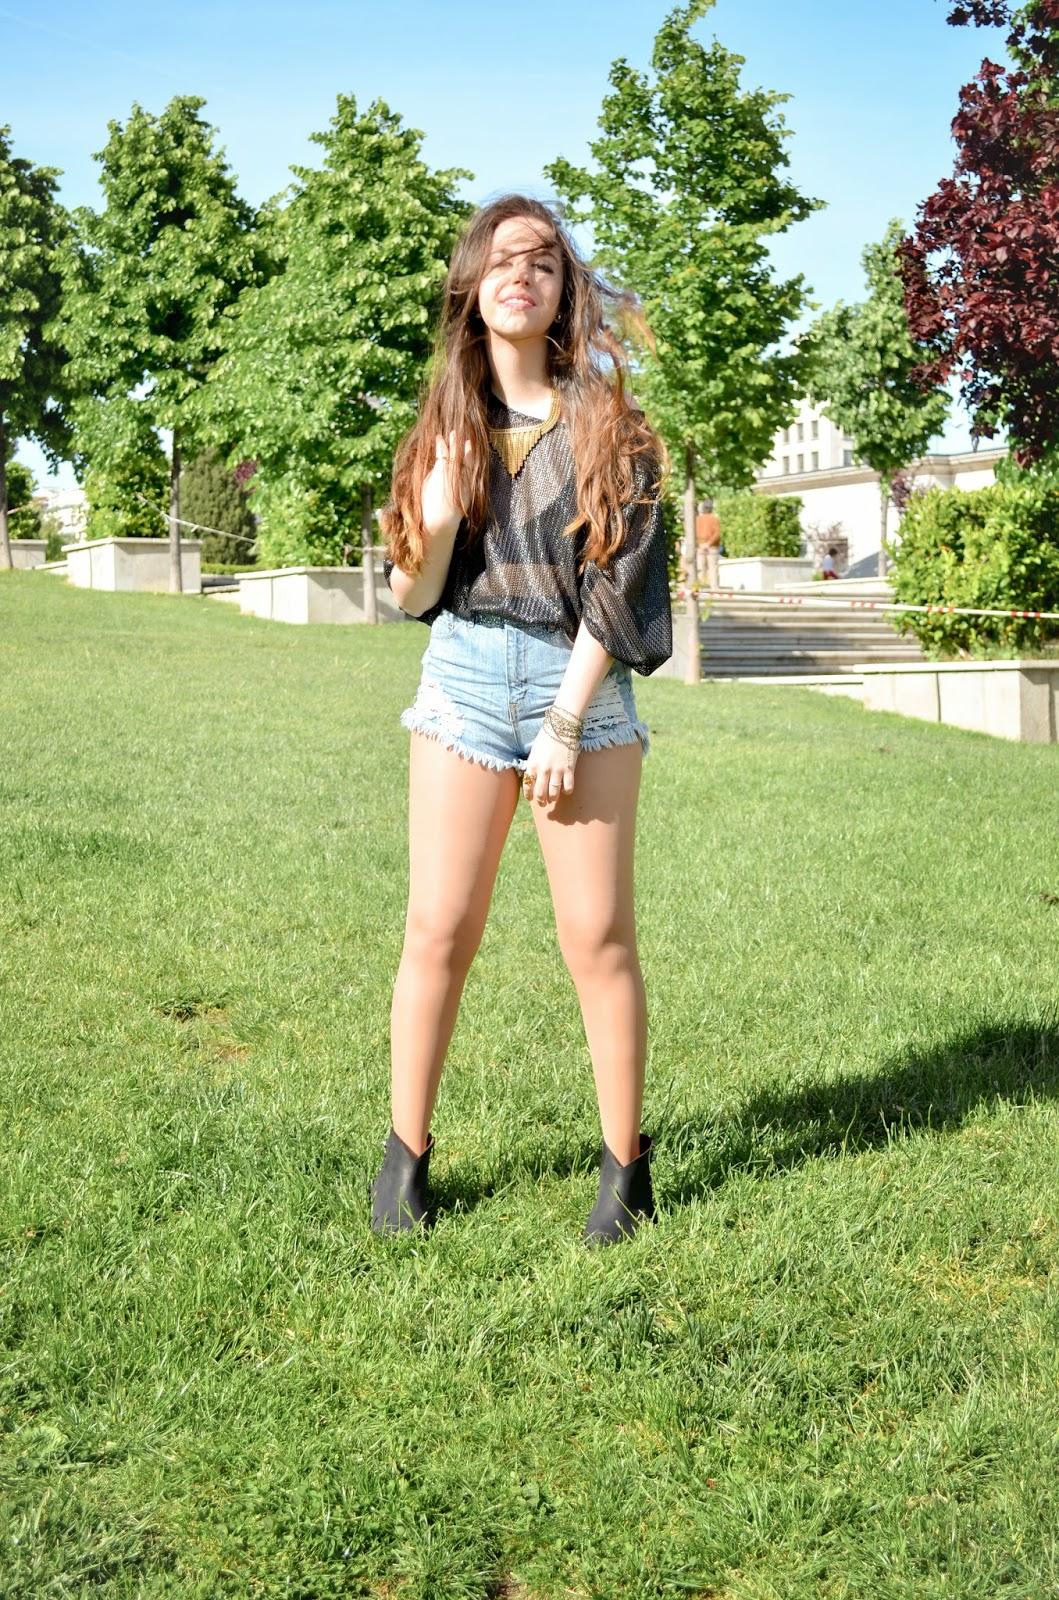 hey vicky hey, victoria suarez, festivales, arenal sound, coachella, blogger, fashion